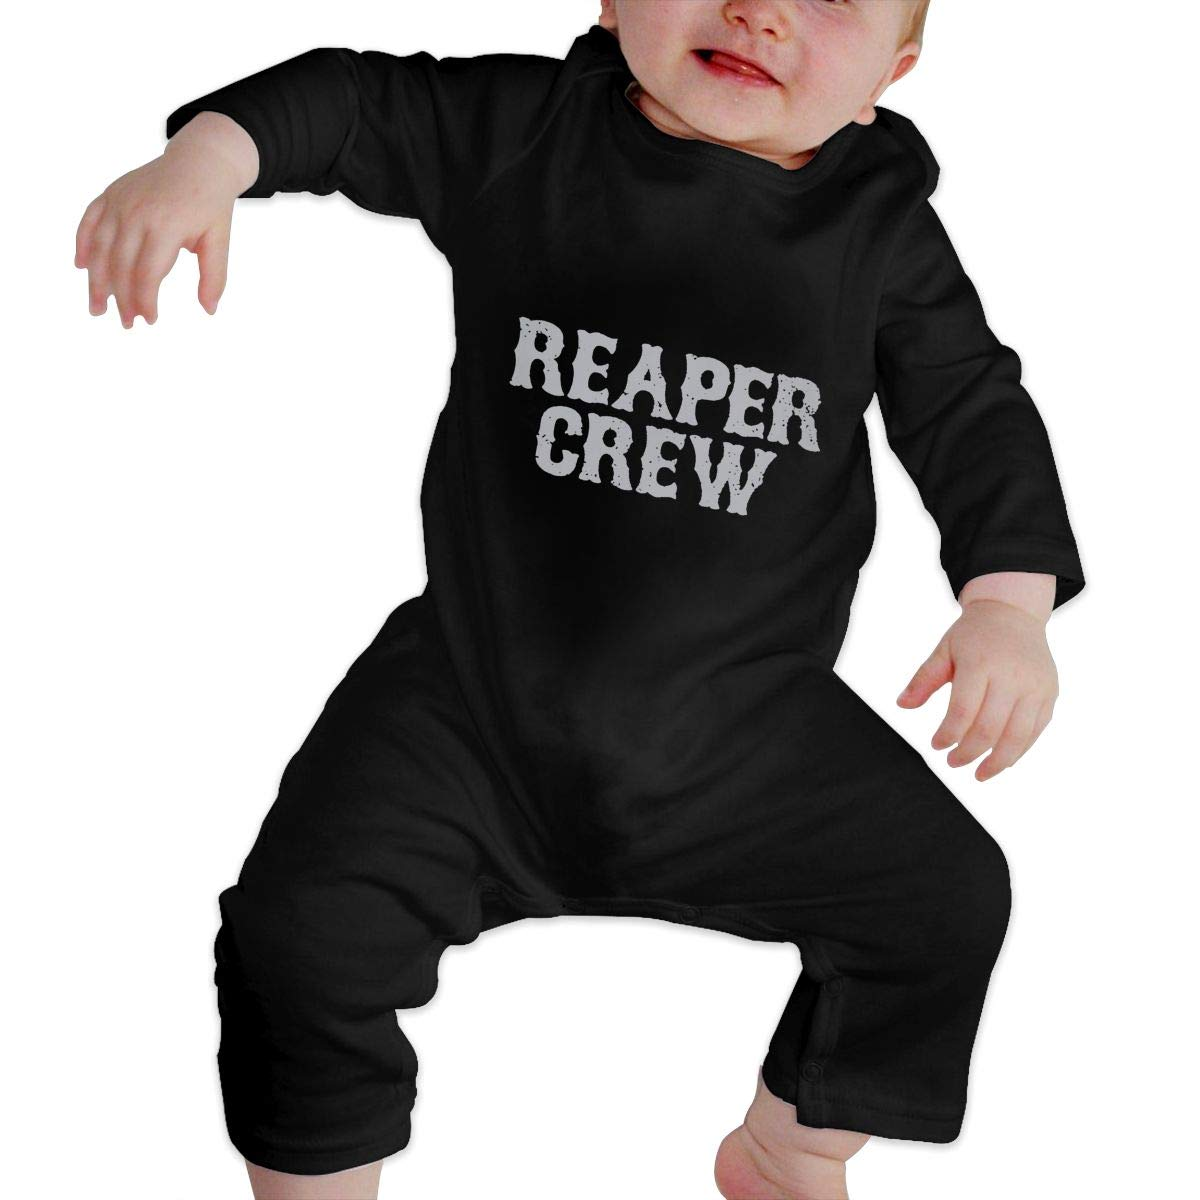 KAYERDELLE Reaper Crew Long-Sleeve Unisex Baby Bodysuits for 6-24 Months Boys /& Girls